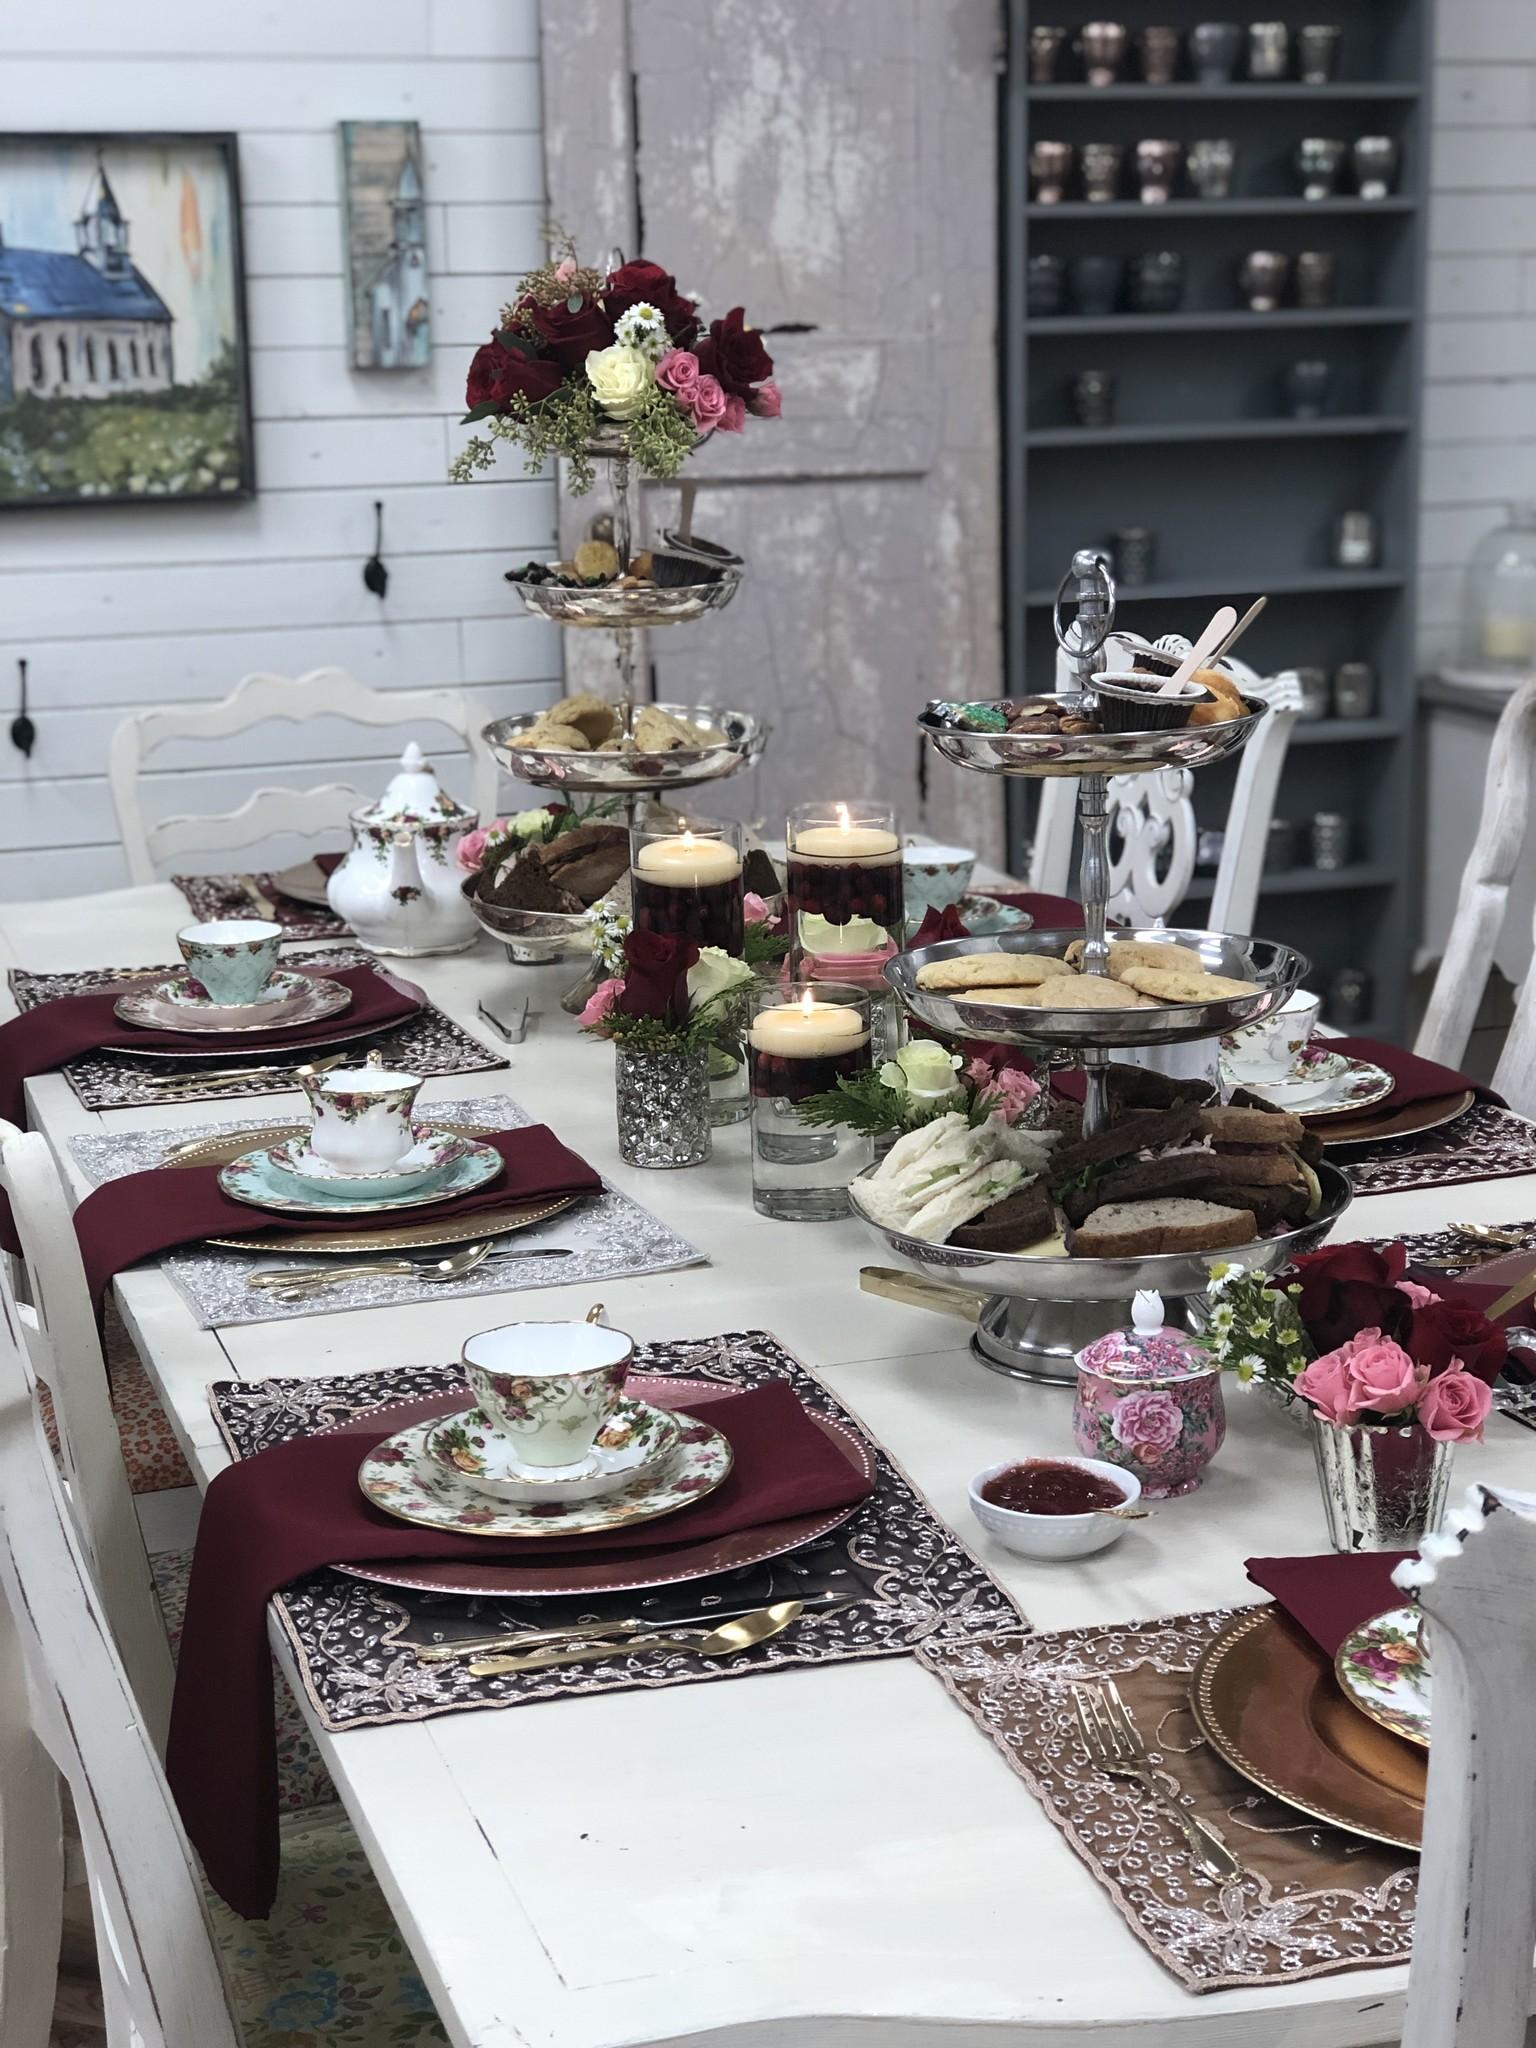 Christmas Tea: Saturday December 14th